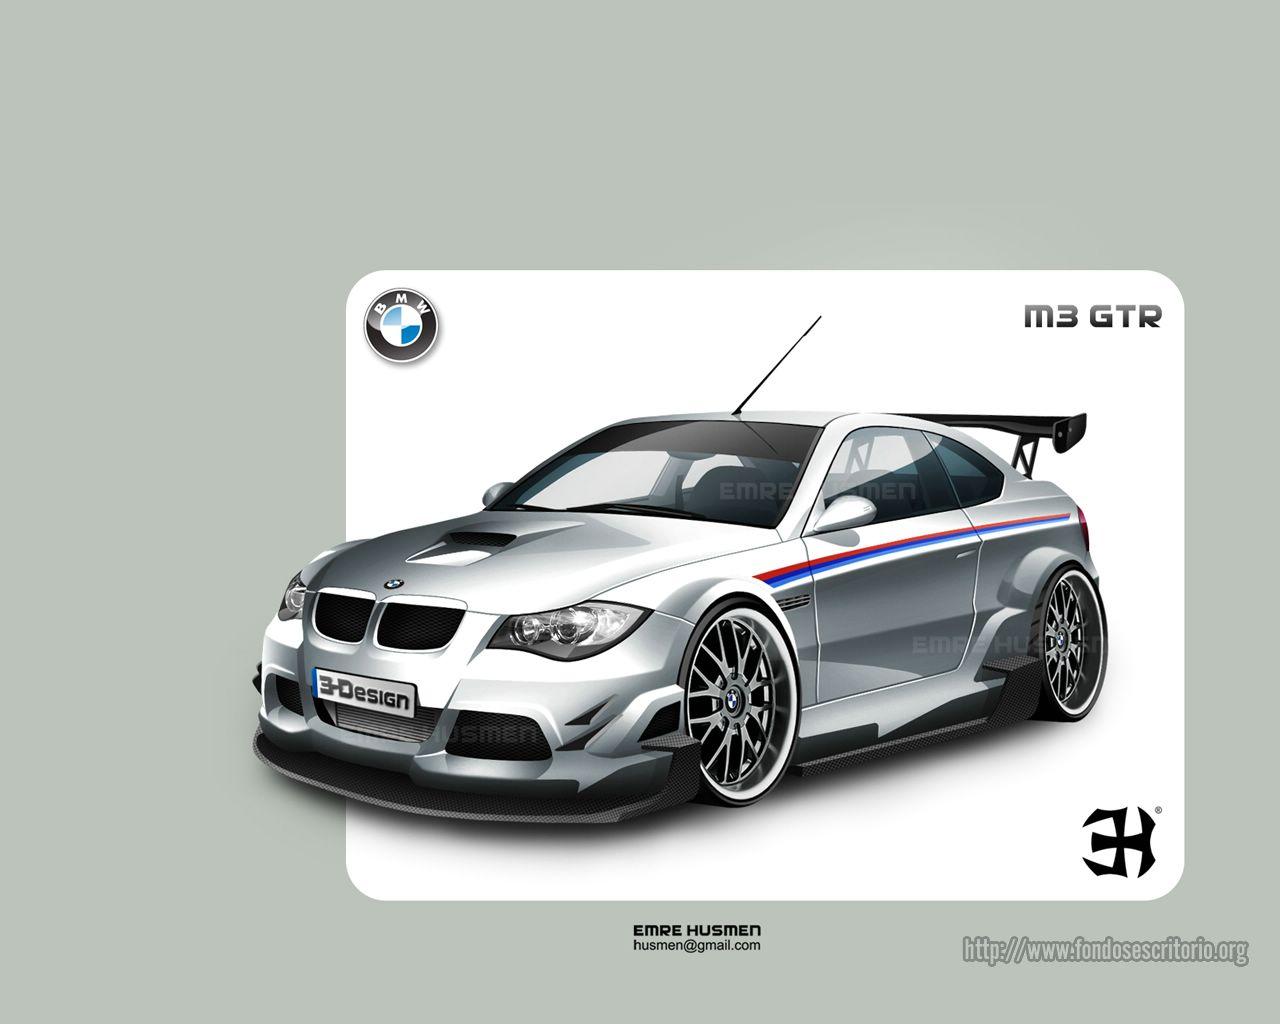 Wallpaper Bmw M3 GTR Serie For Ios